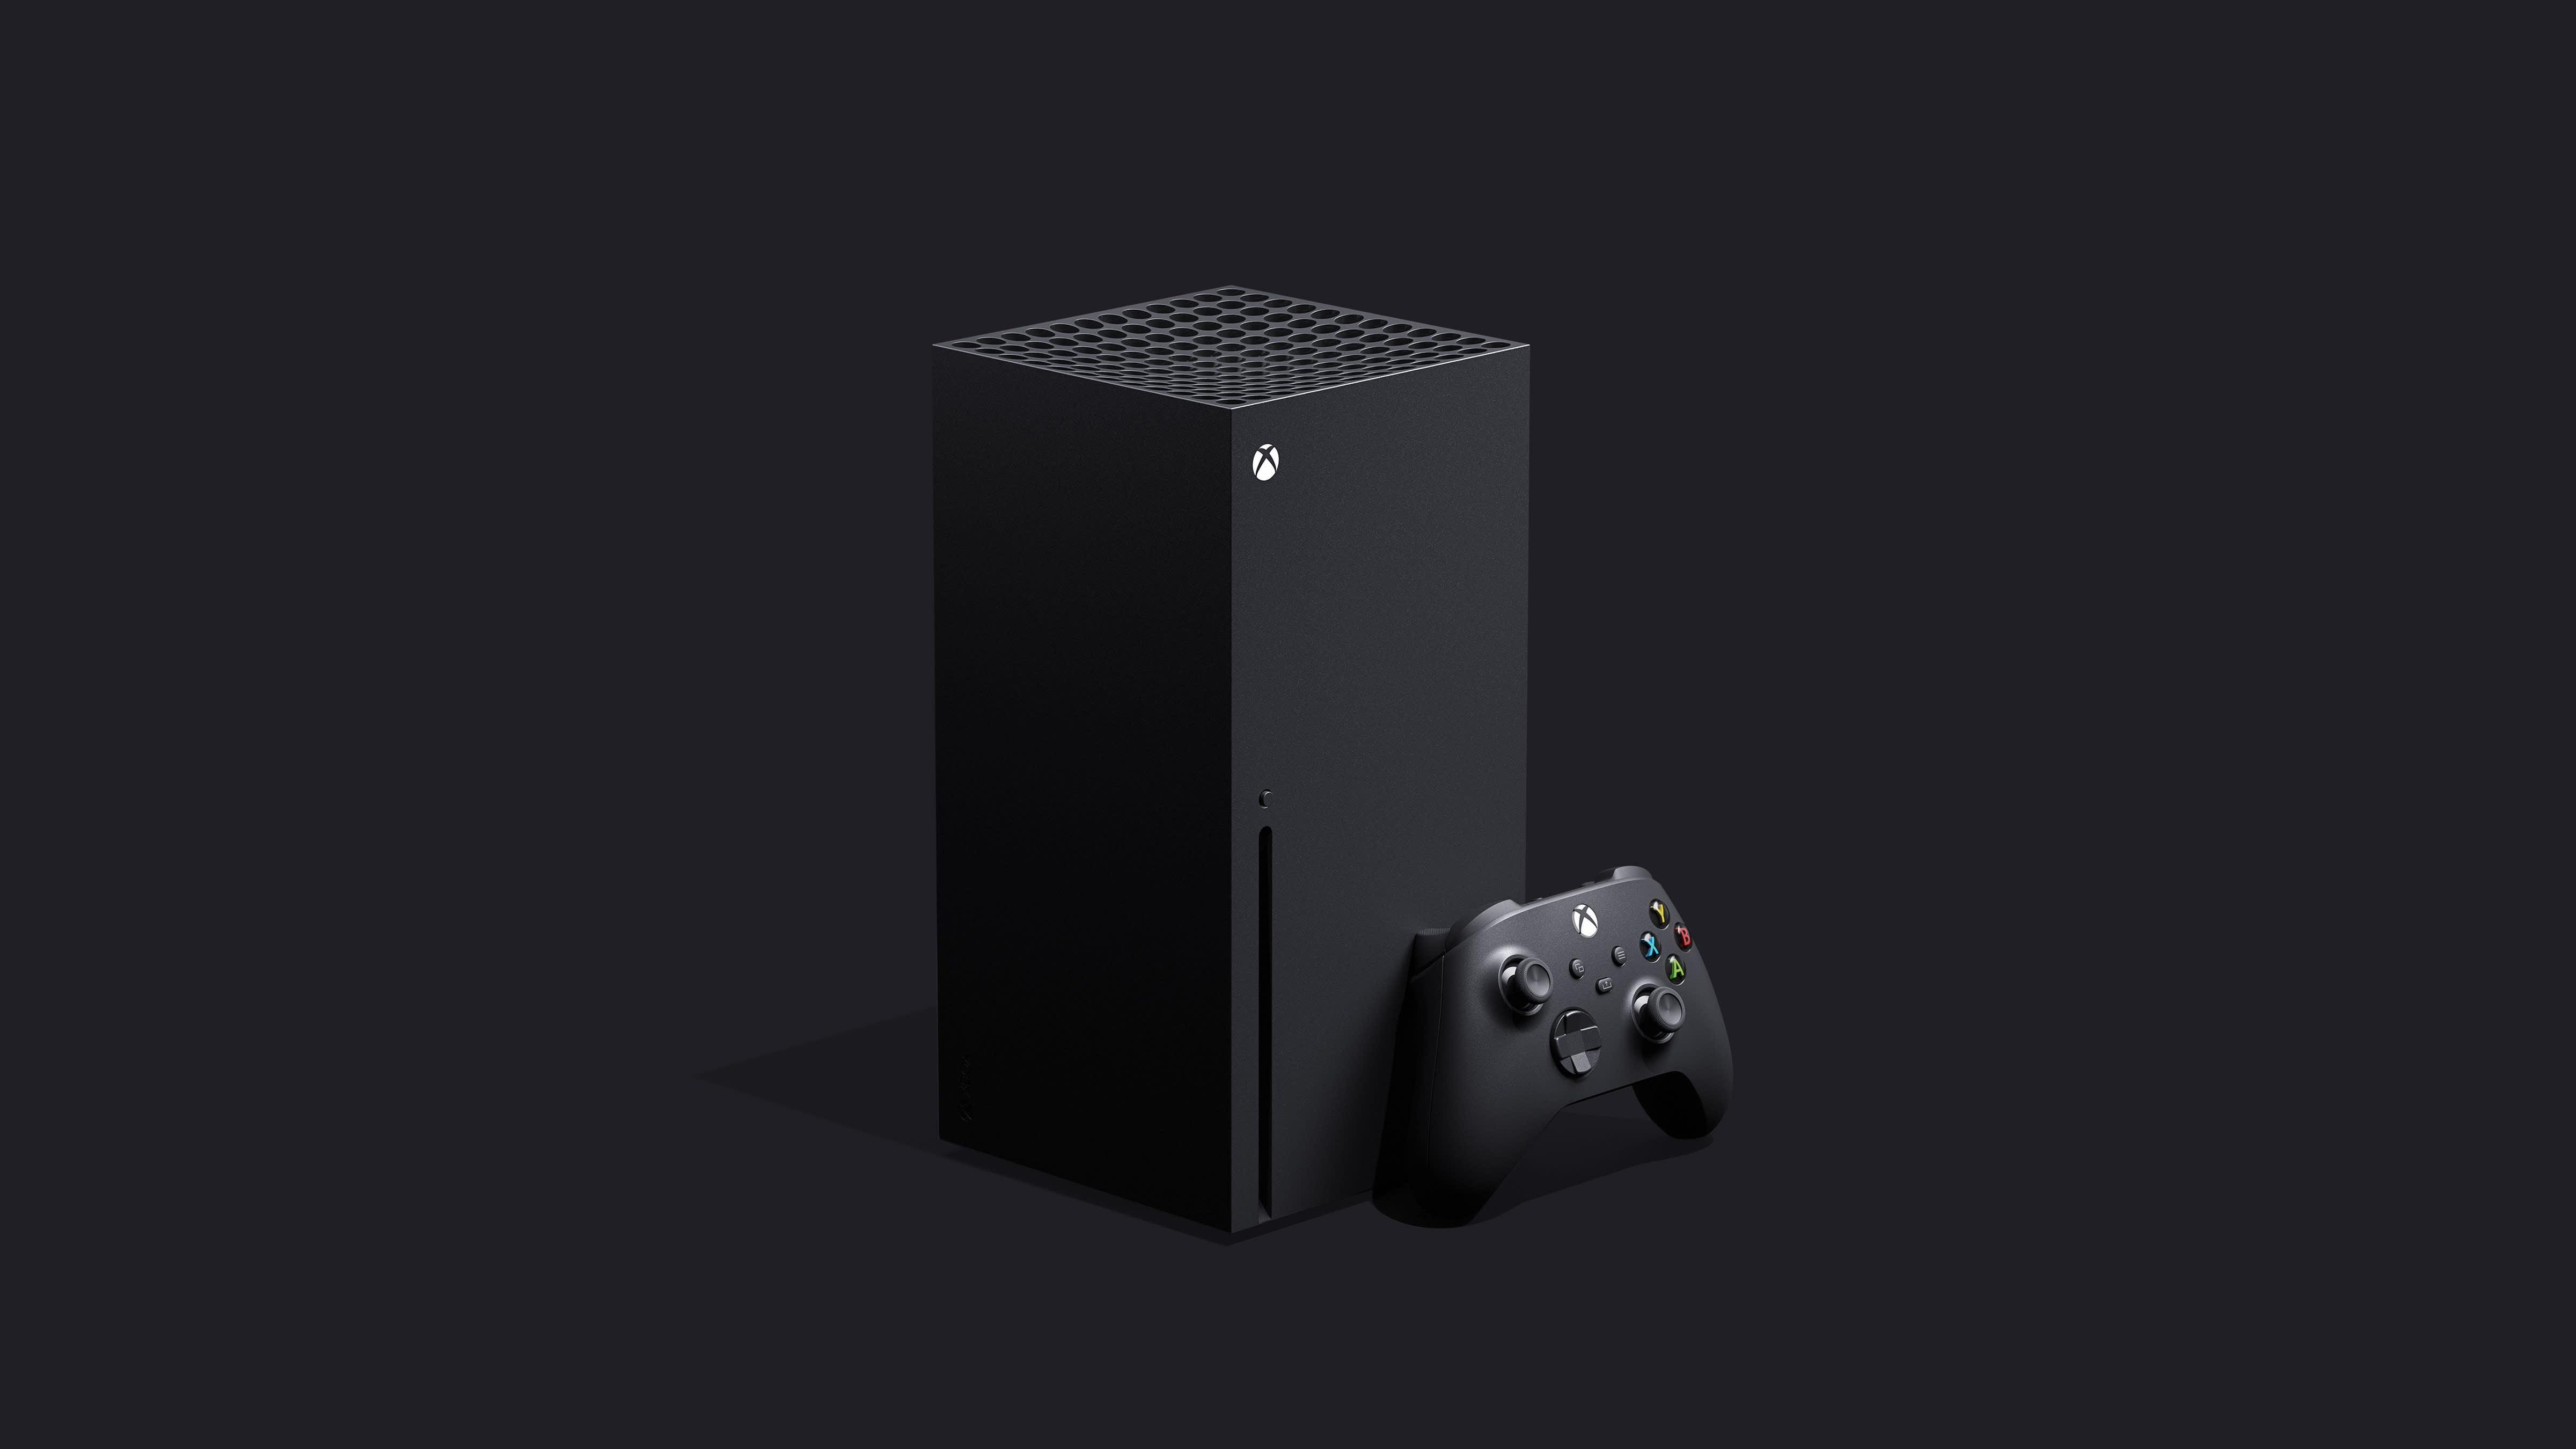 Microsoft Unveils Its Next Gen Xbox Series X Console